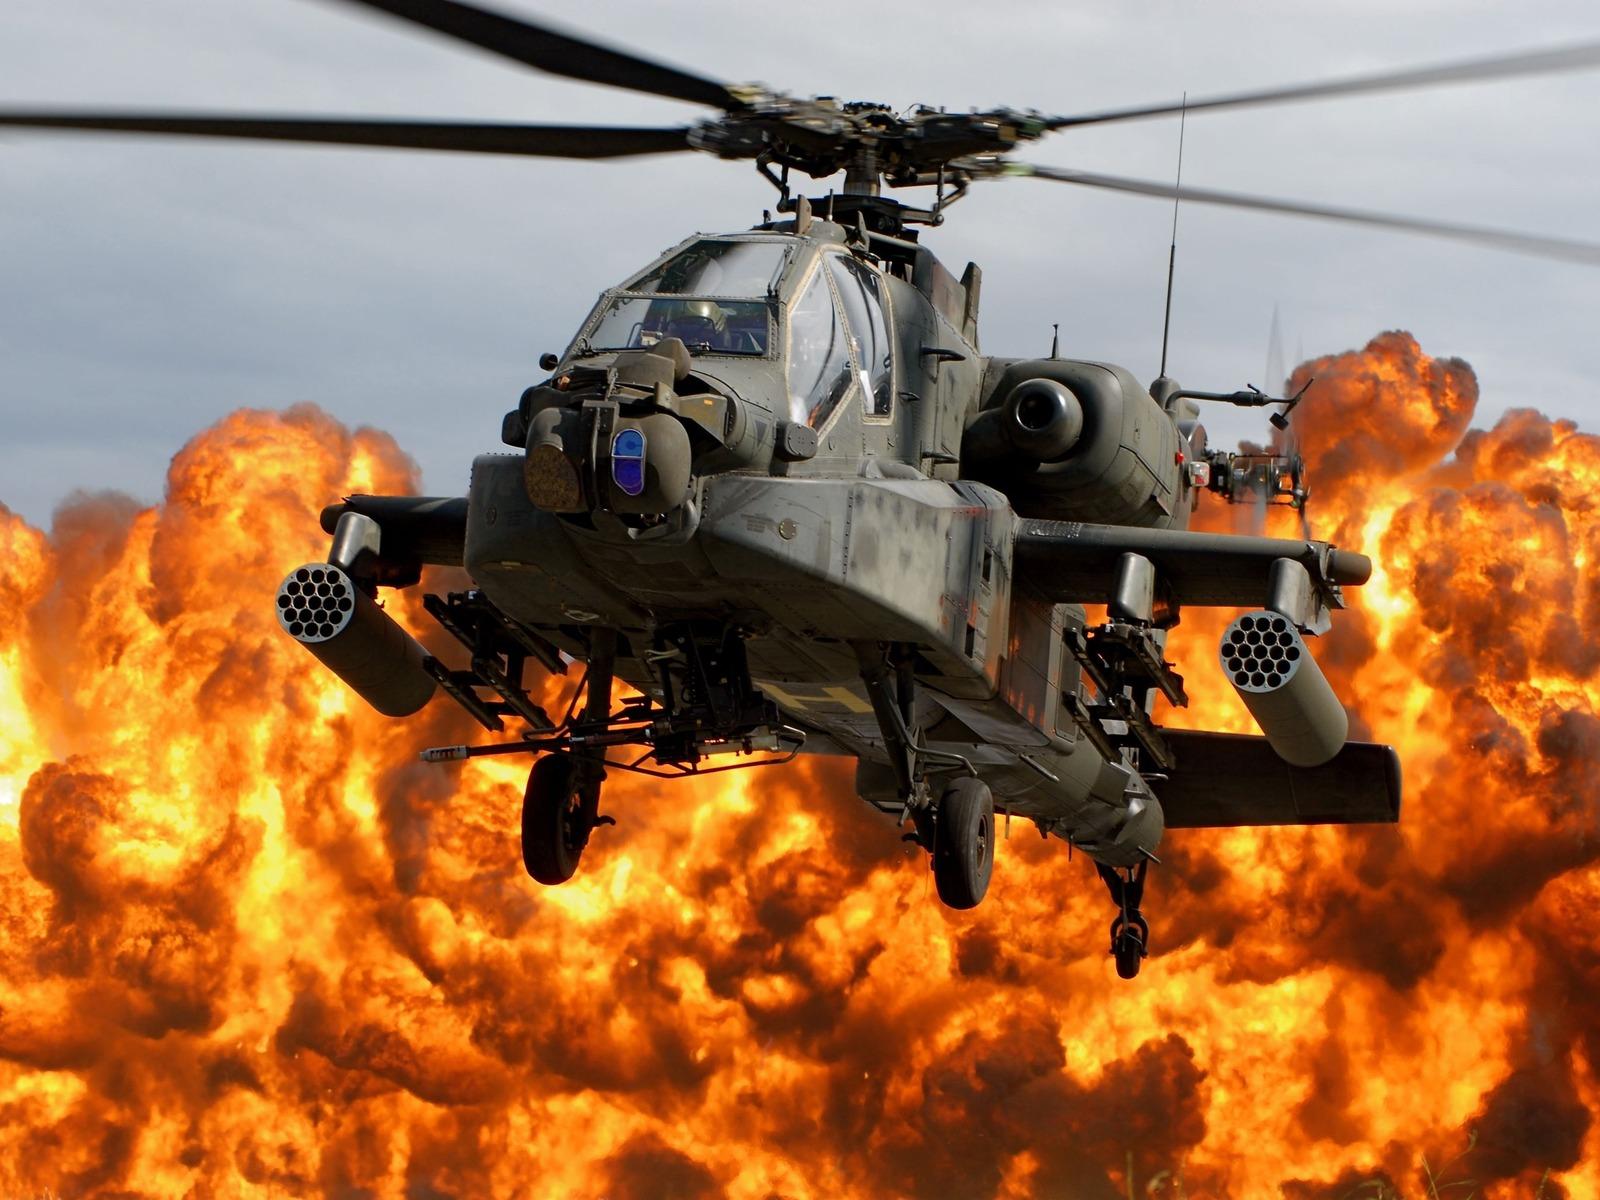 A tutta gnocca! (Parte seconda) - Pagina 5 Ah-64d-apache-wallpaper-helicopter-blade-cab-explosion-fire-napalm-127634-1600x1200